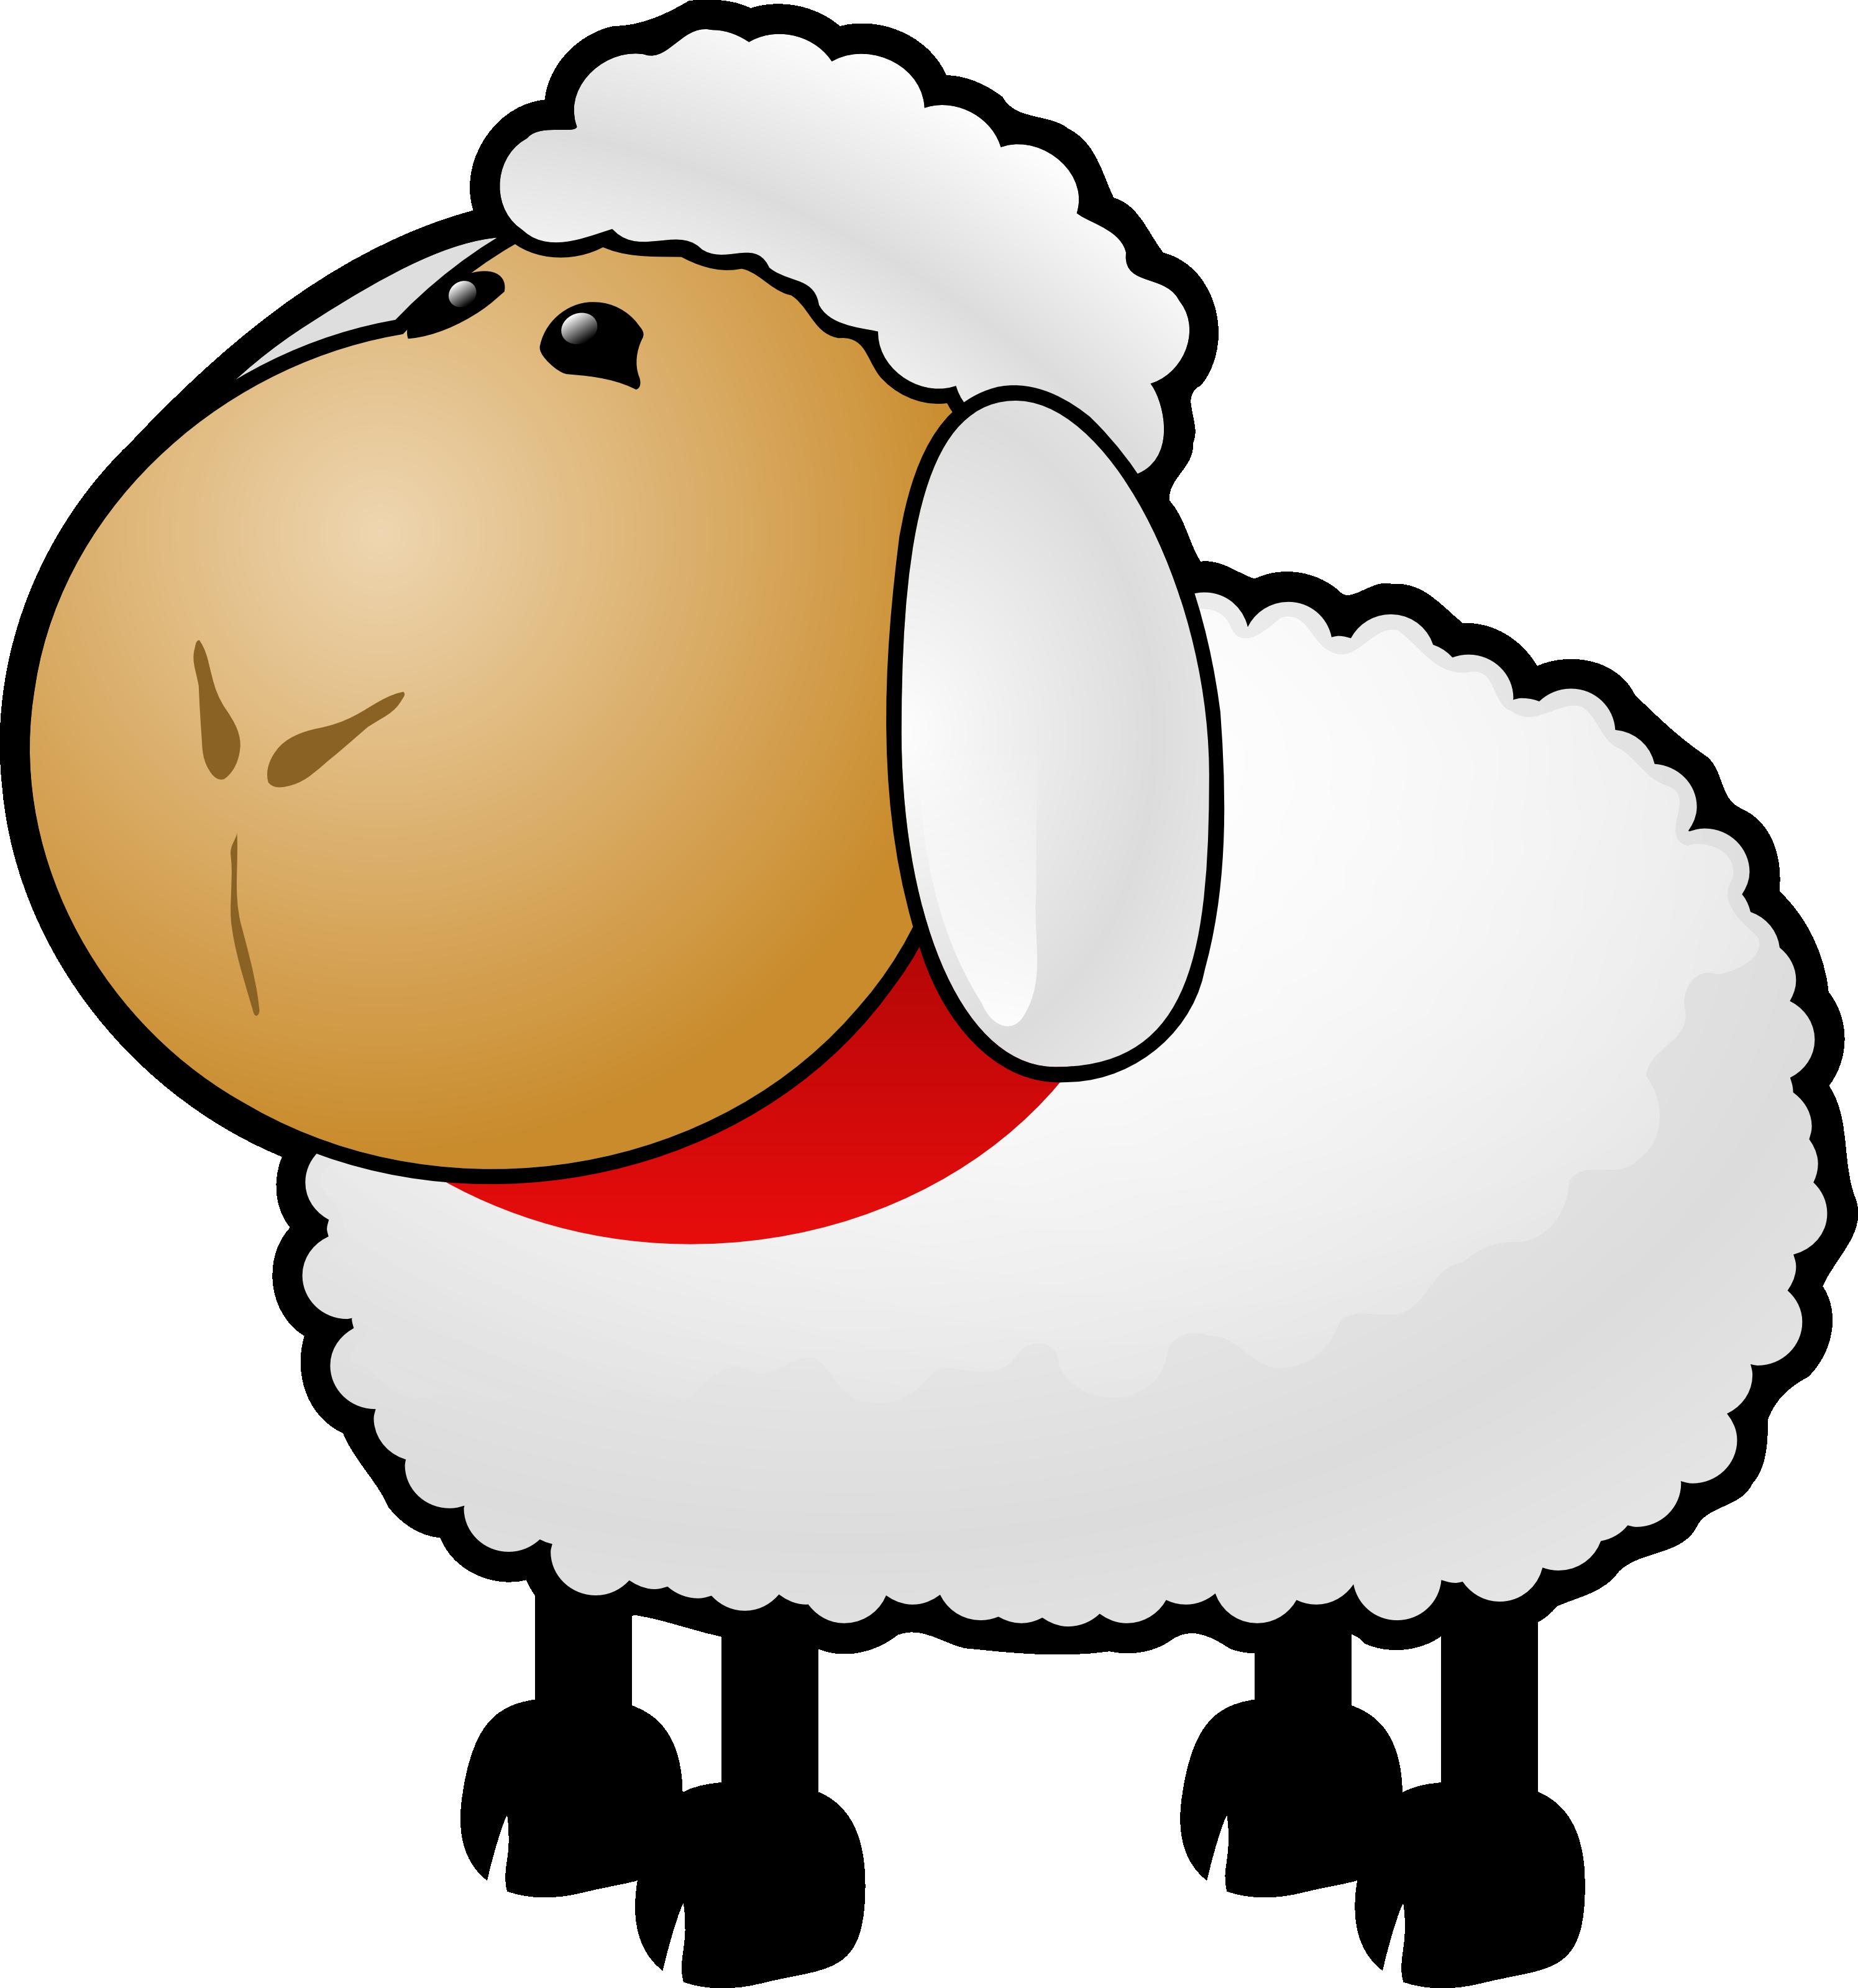 Sheep clipart transparent background #10